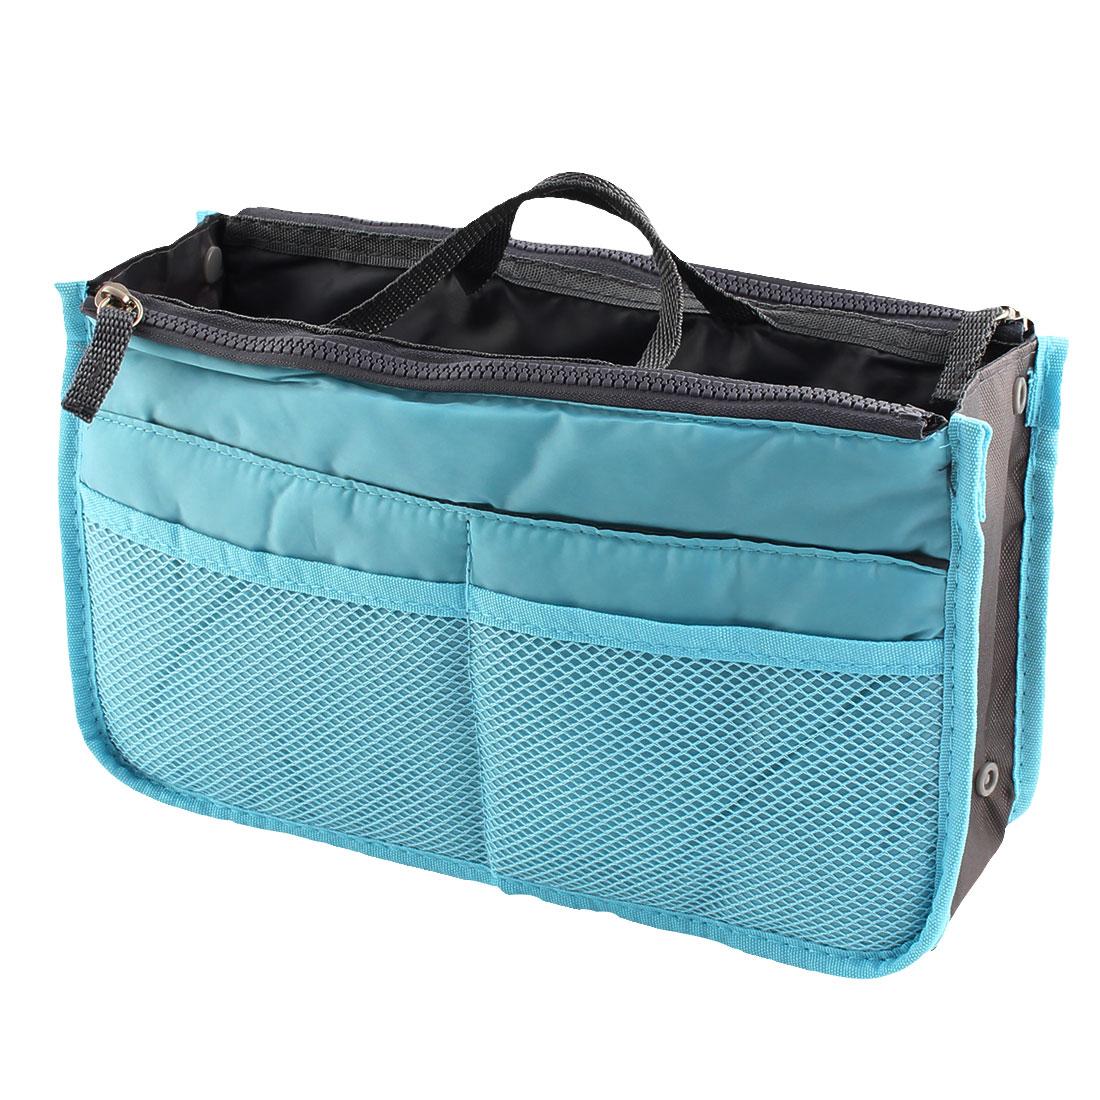 Portable Multi-functional Storage Bag Handbag Organizer Holder Container Sky Blue